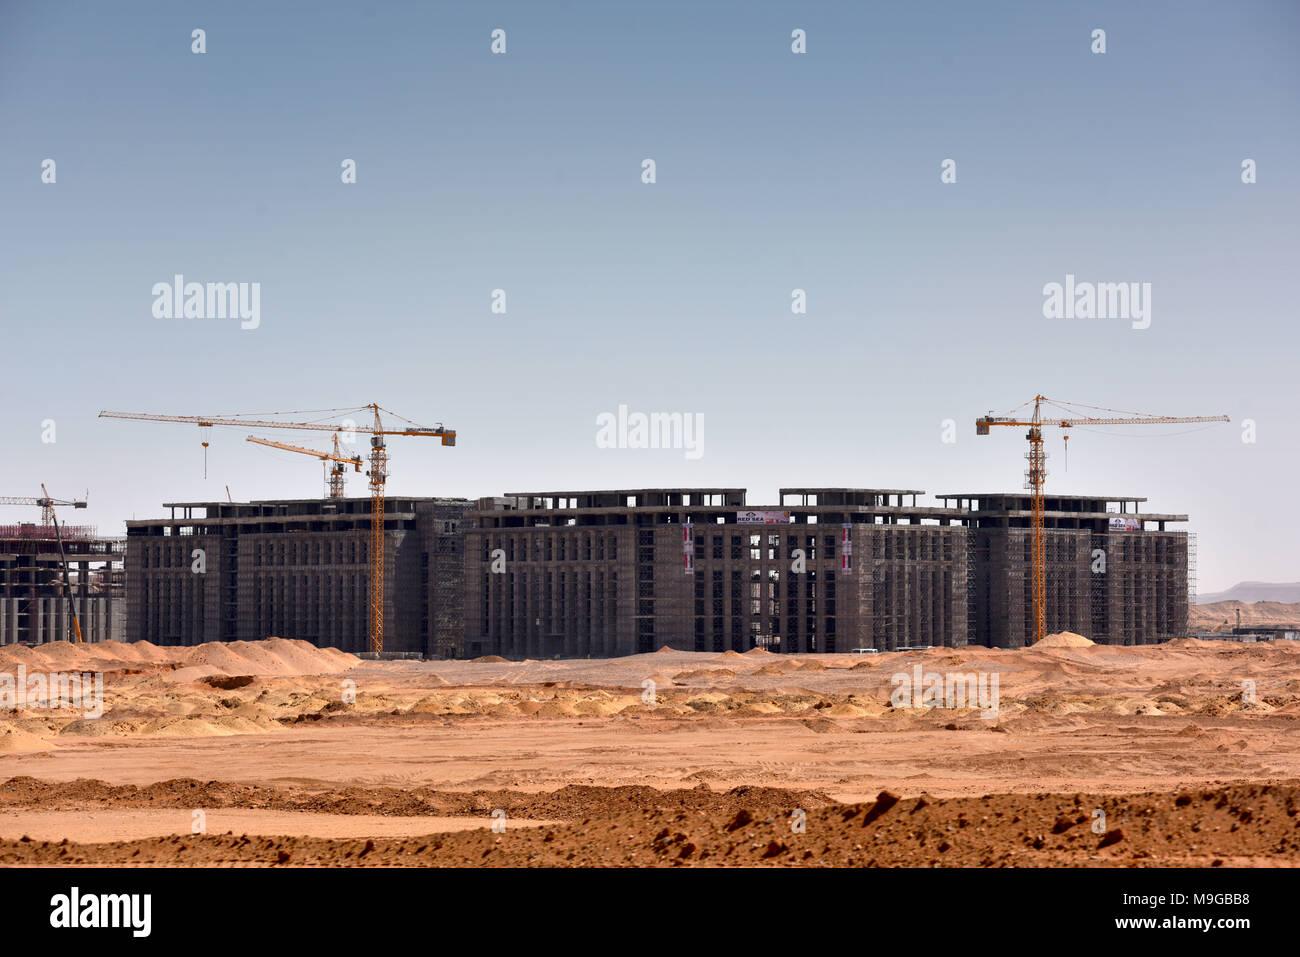 New Administrative Capital Egypt Stock Photos & New